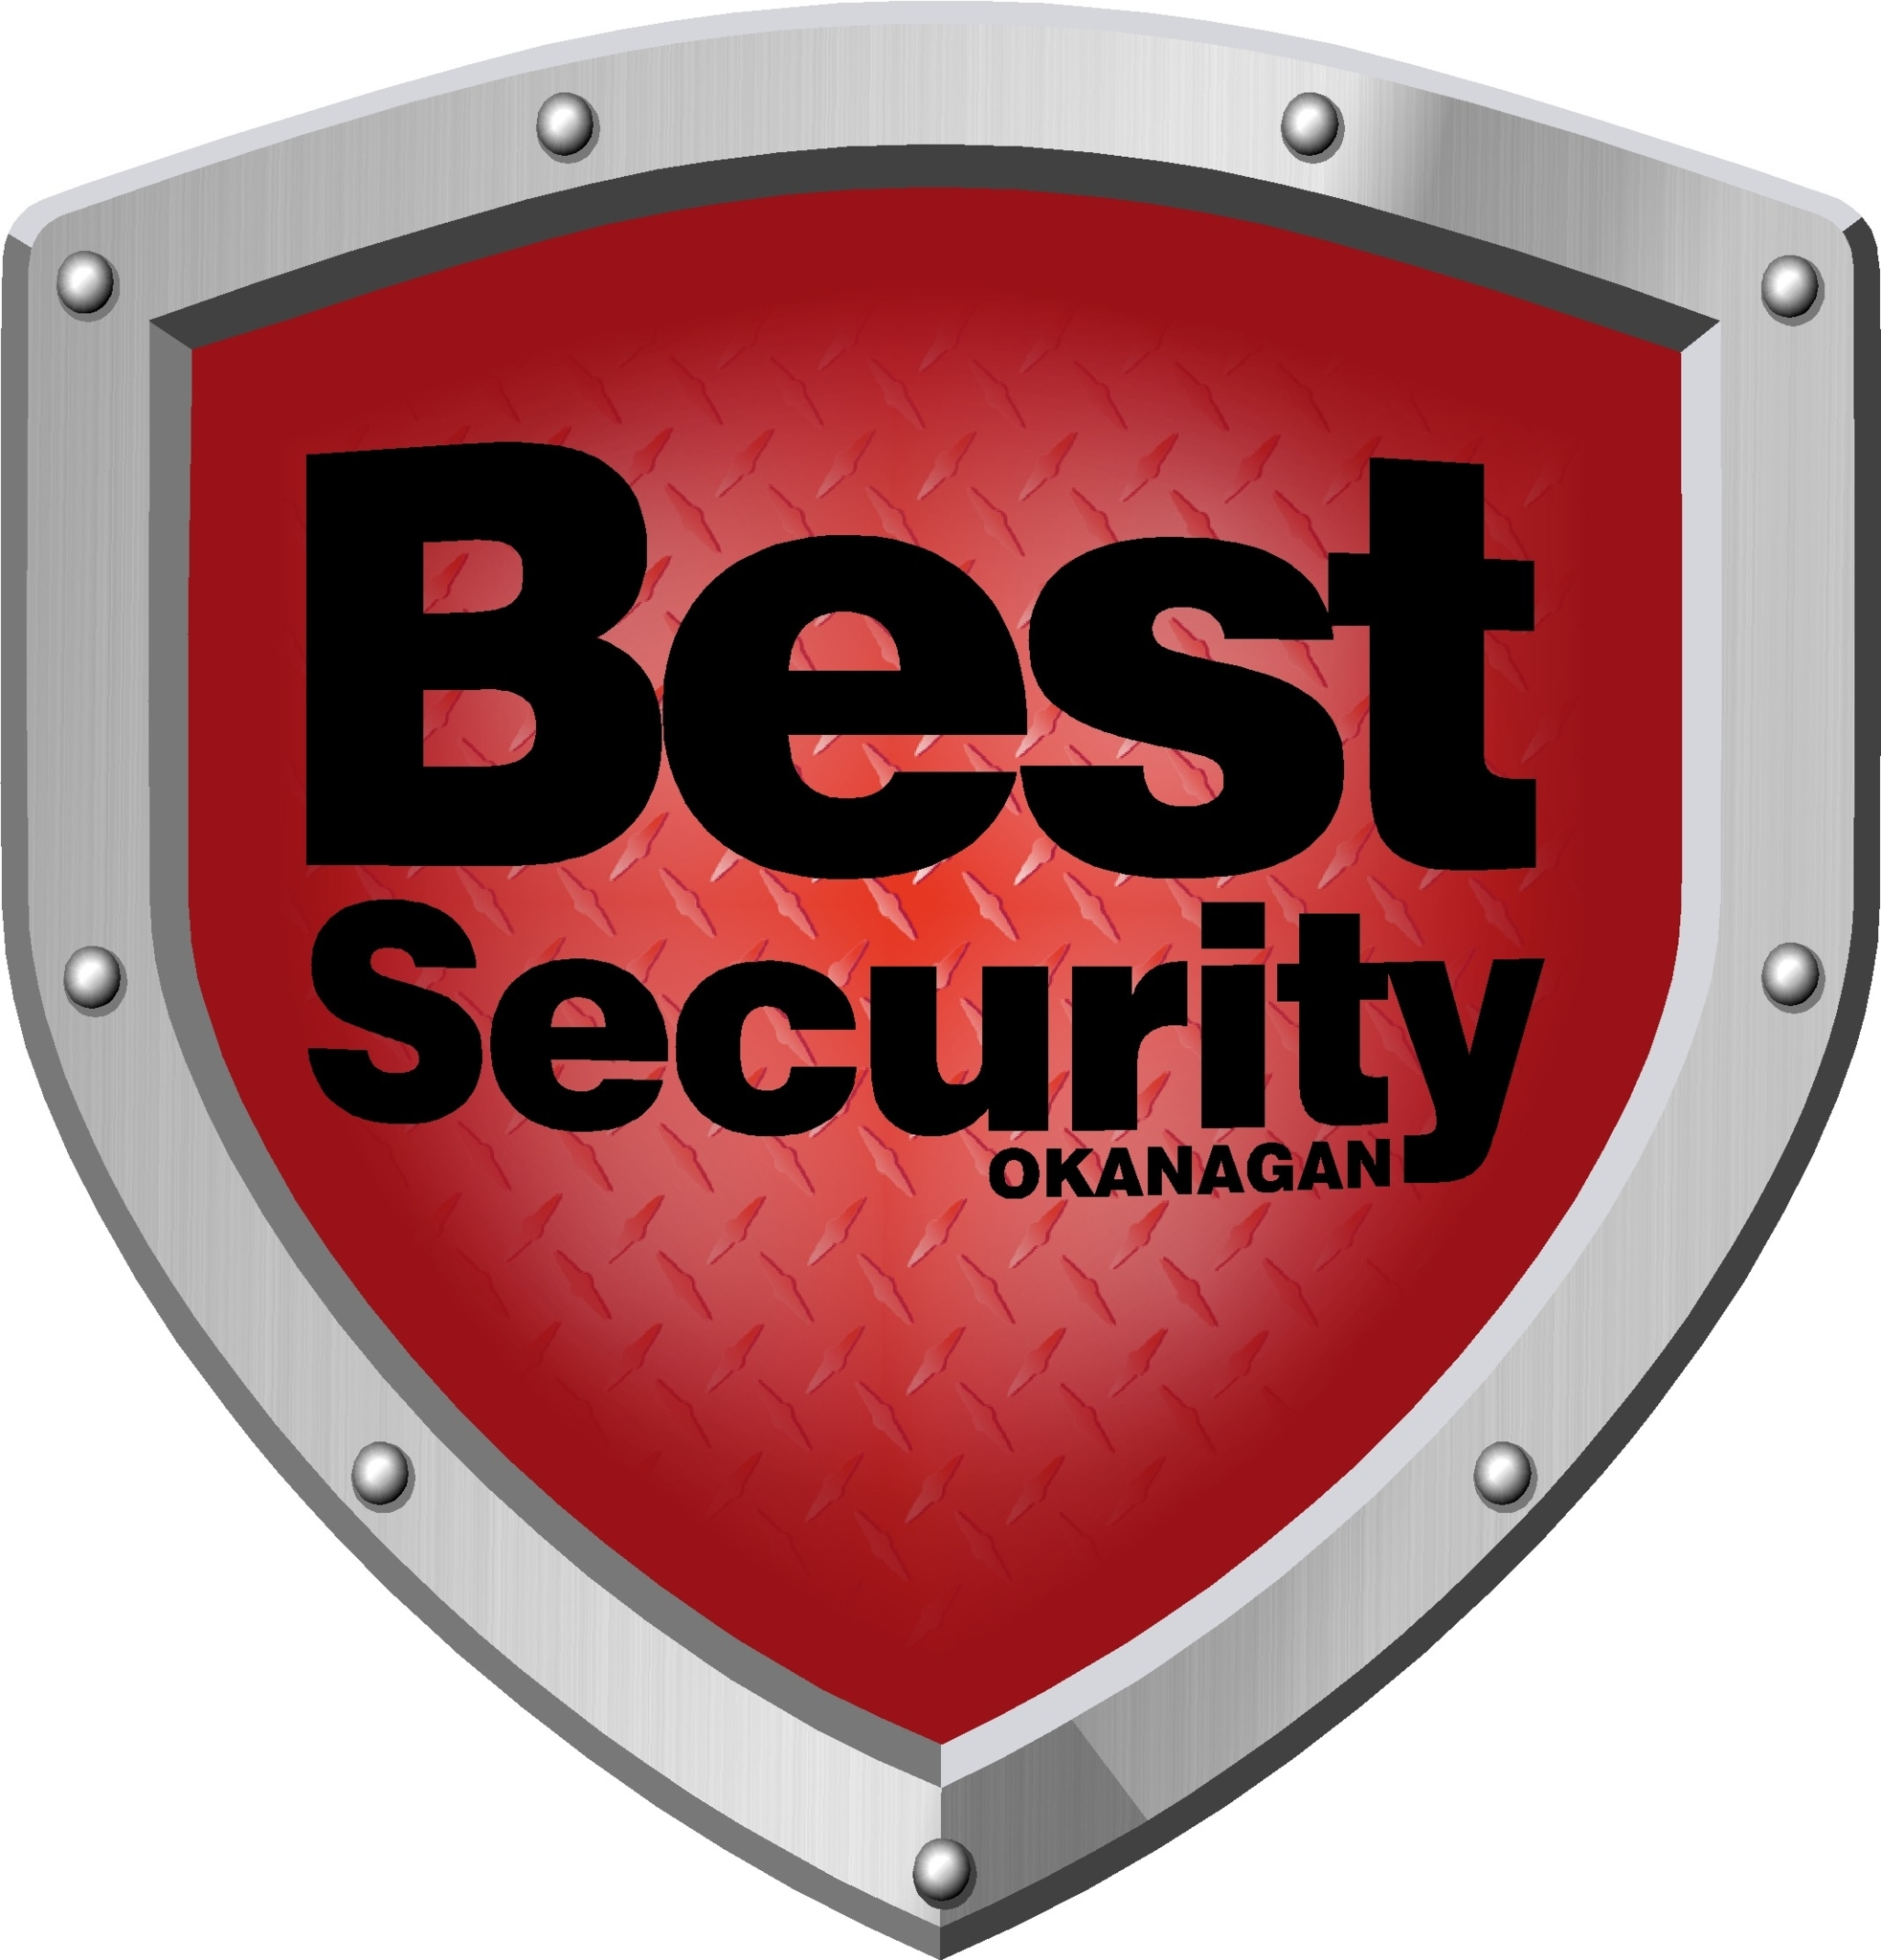 Best Security Okanagan Kelowna (250)826-8395